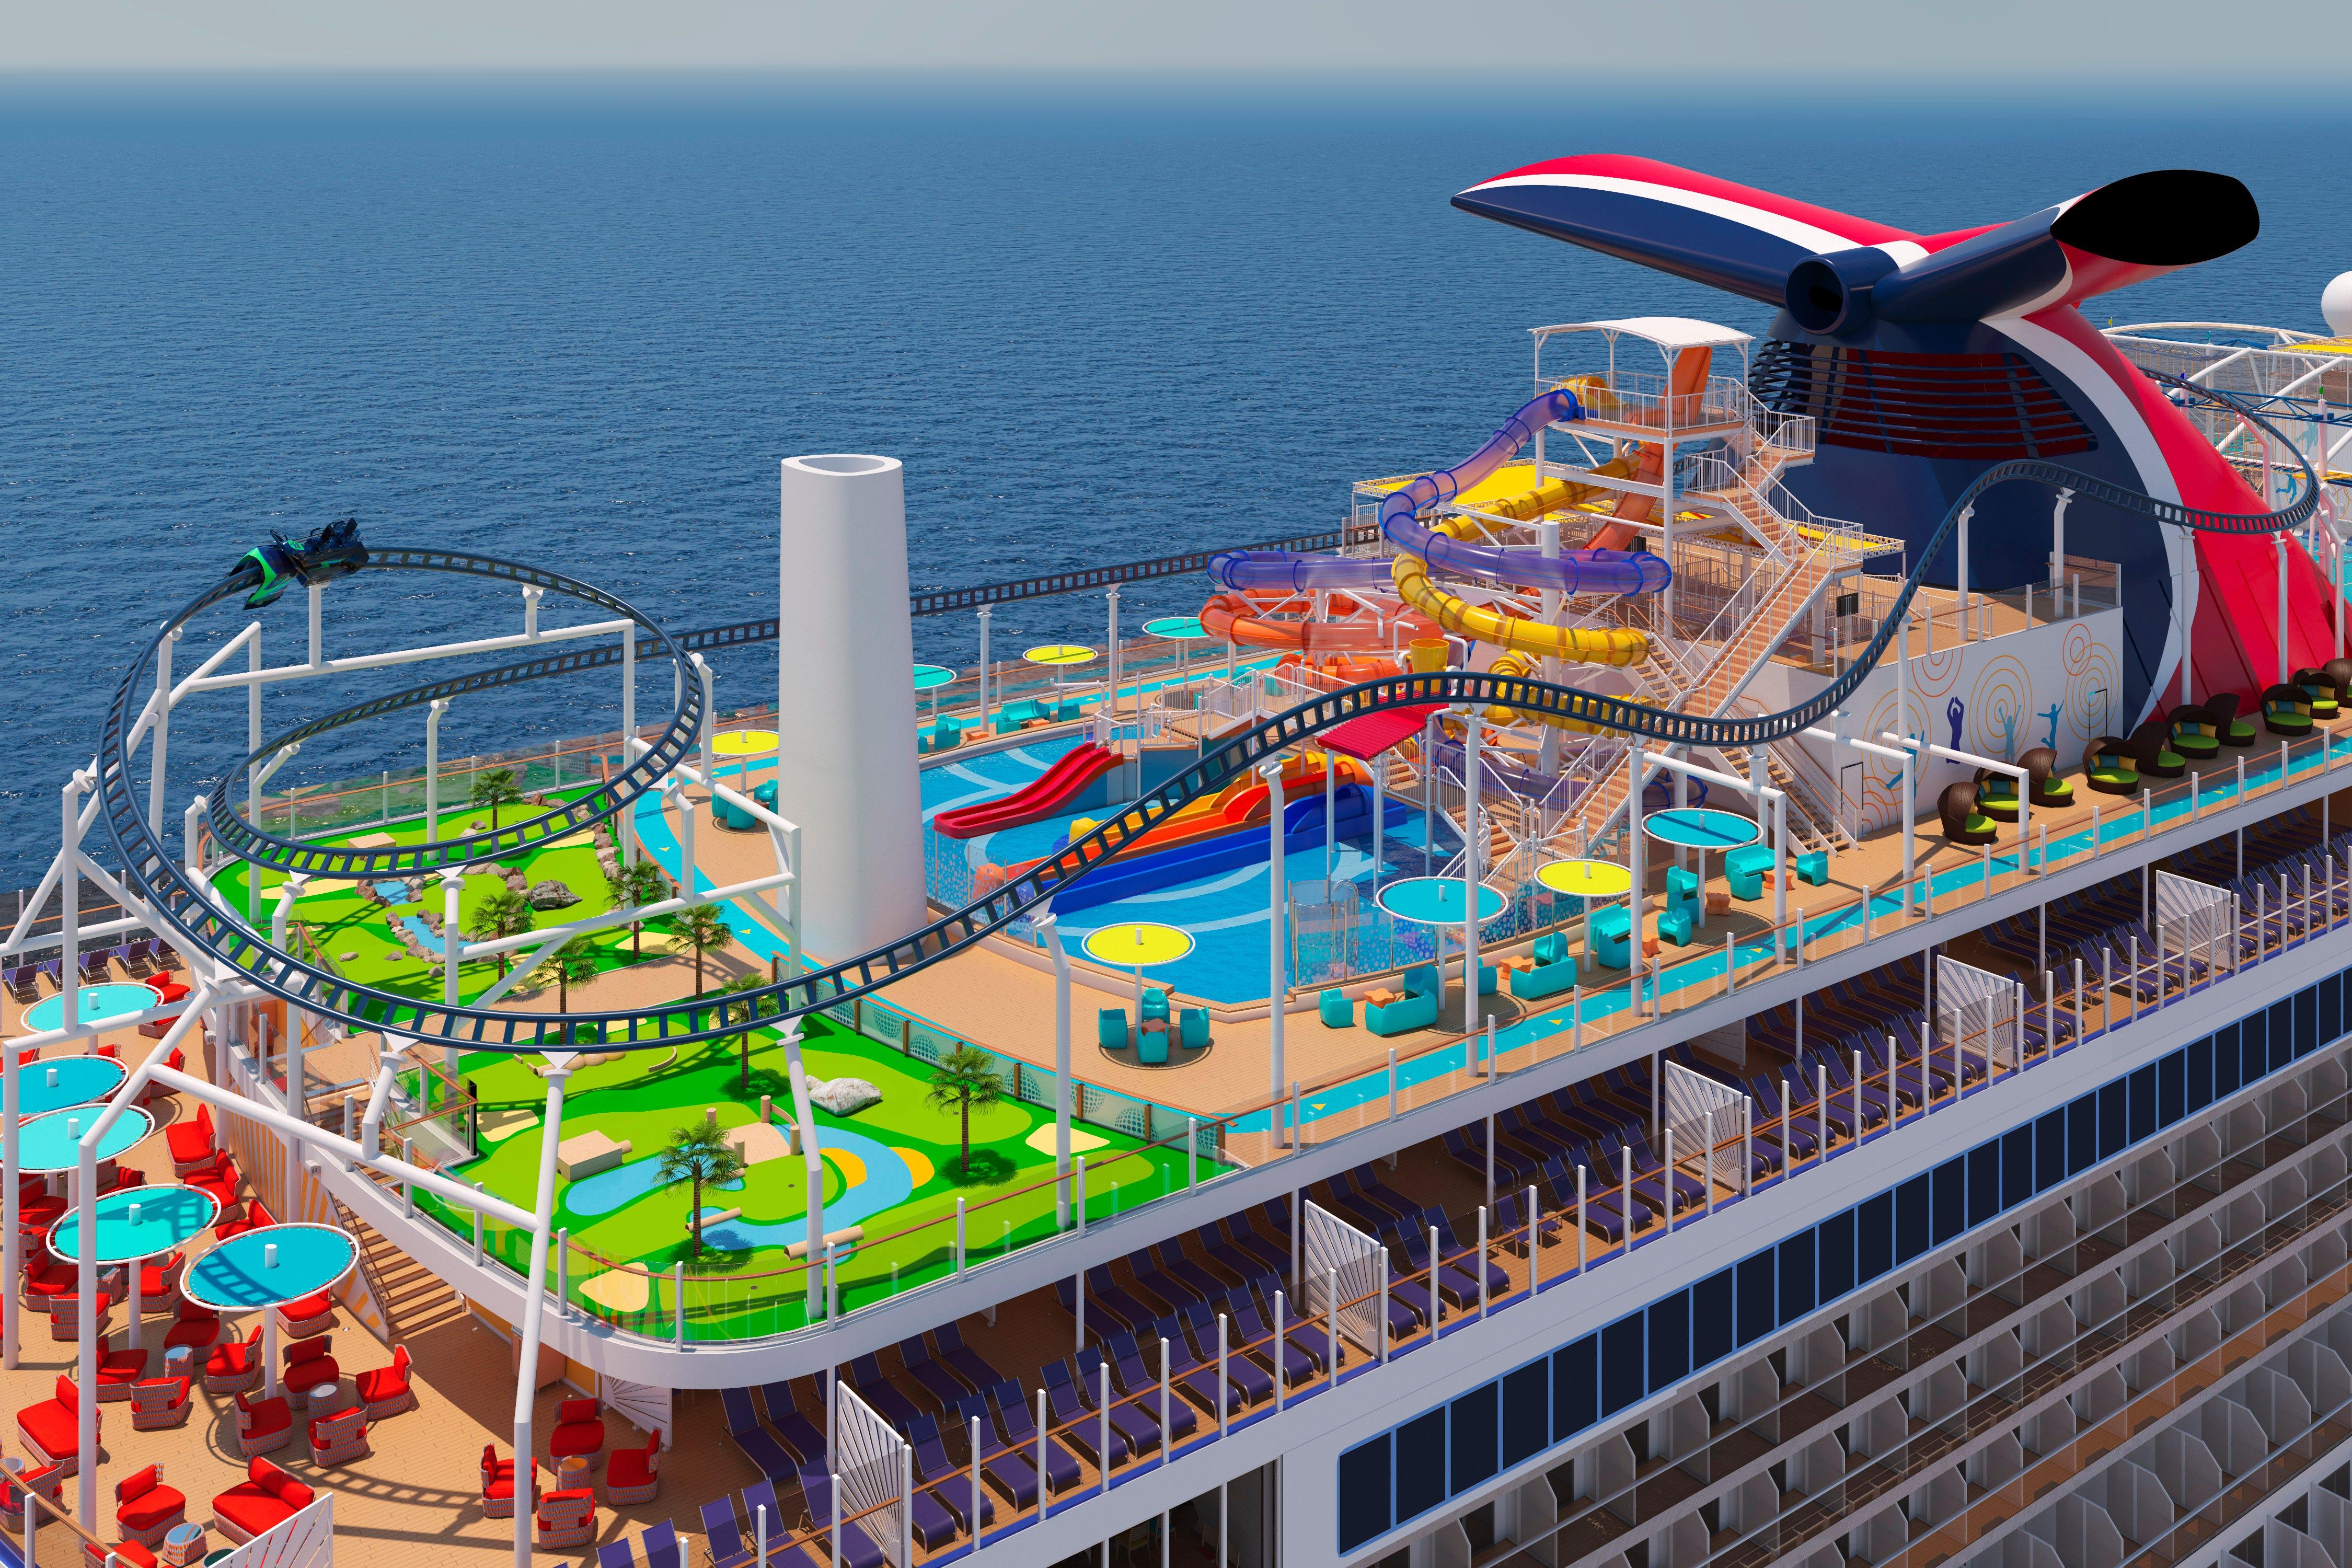 Carnival Cruise celebrates 49th birthday of the company